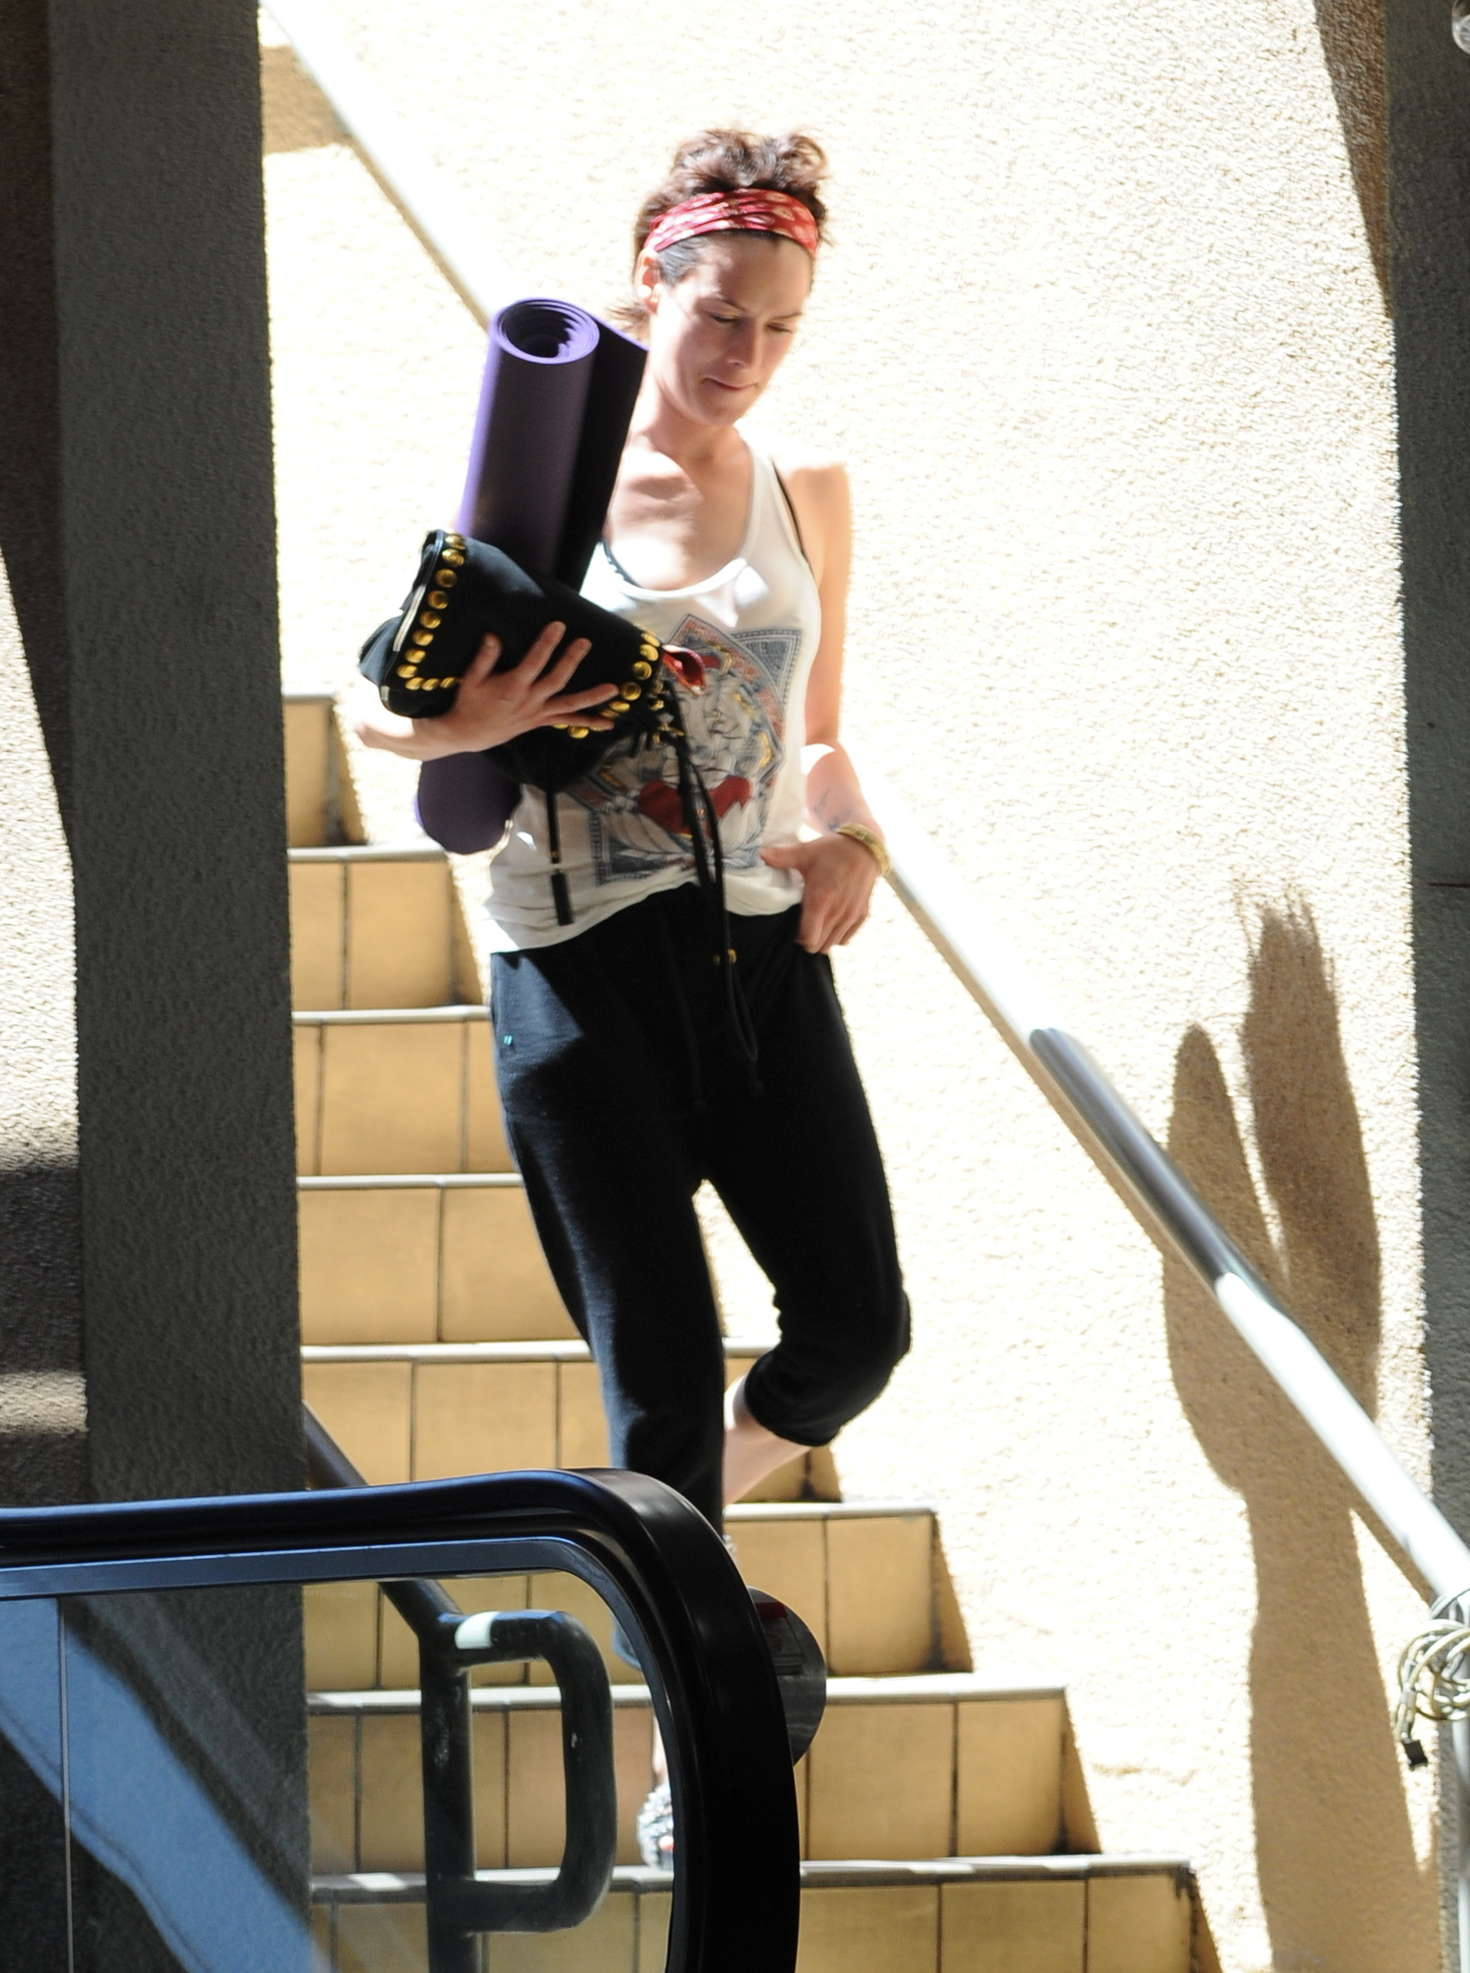 Lena Headey Leaving Yoga 01 10 Things You Never Knew About Lena Headey